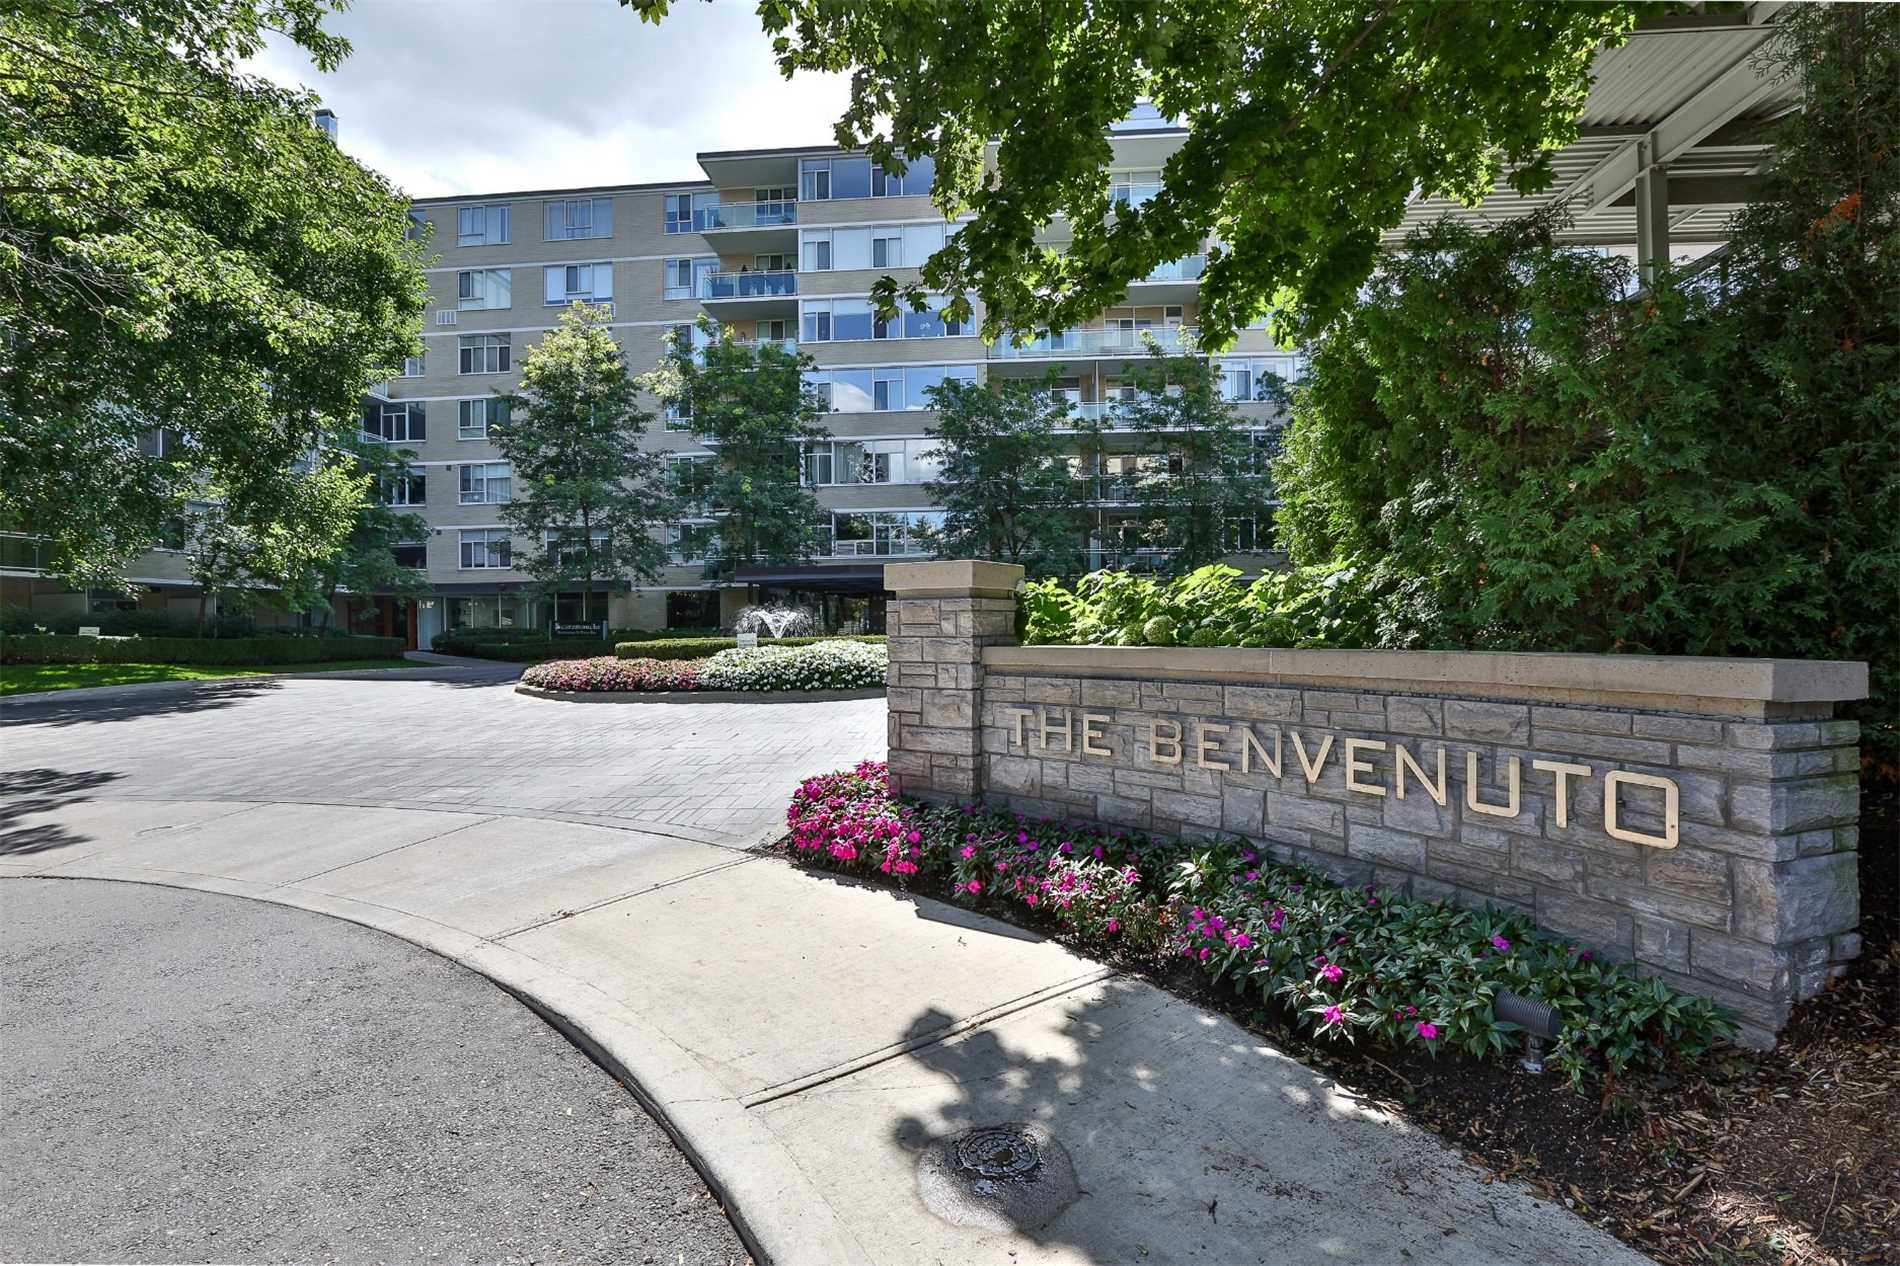 506 - 1 Benvenuto Pl, Toronto, M4V2L1